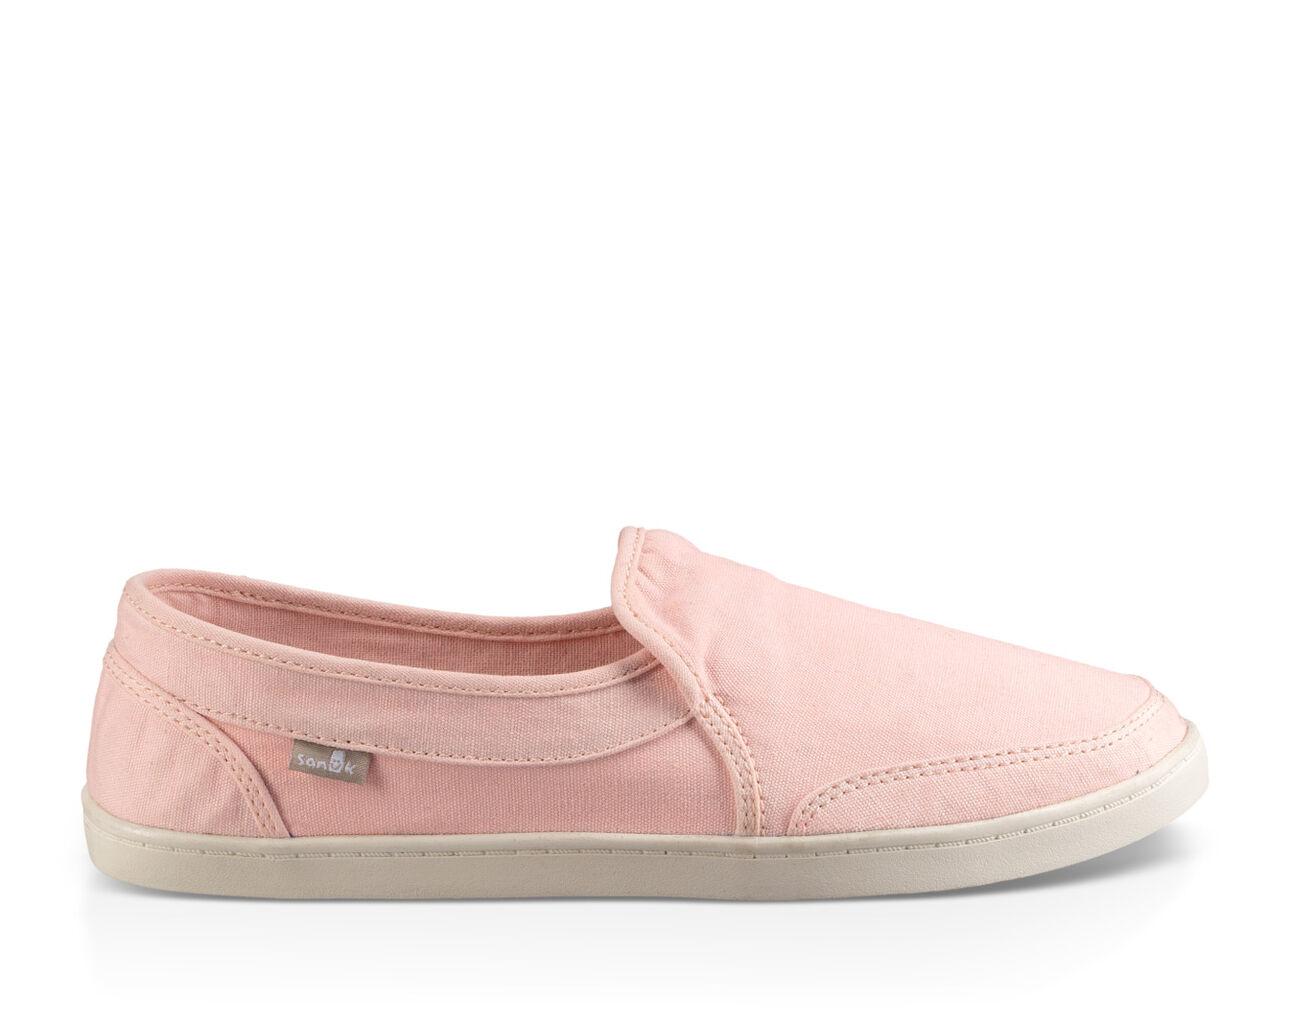 Dillatds shoes / Free calvin klein